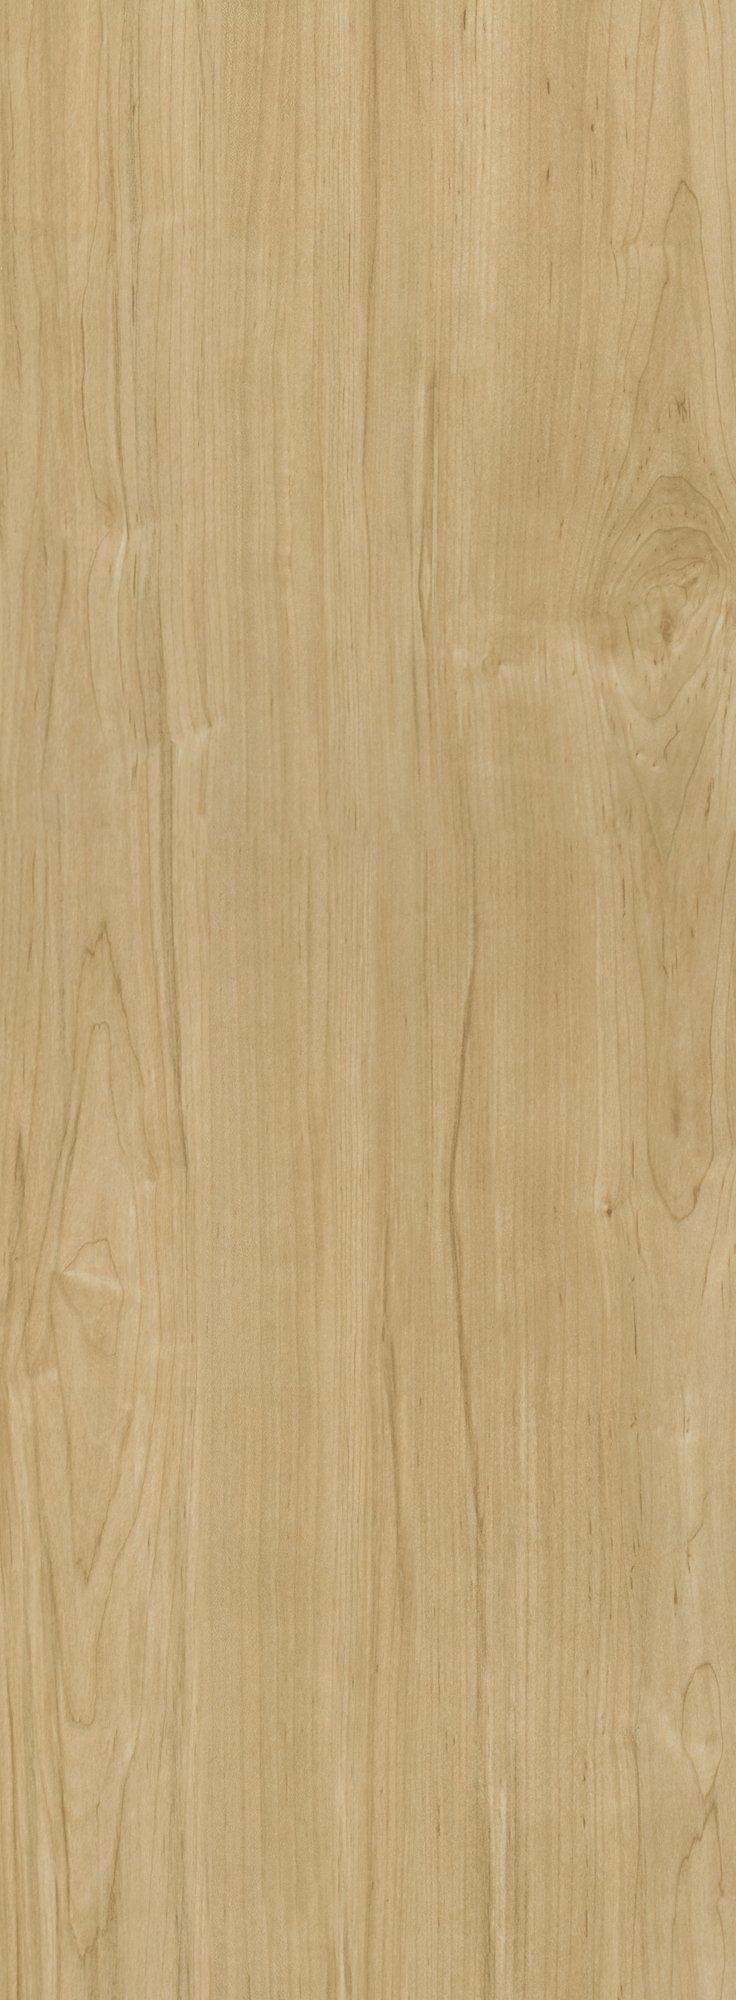 29++ Planked urban oak inspirations